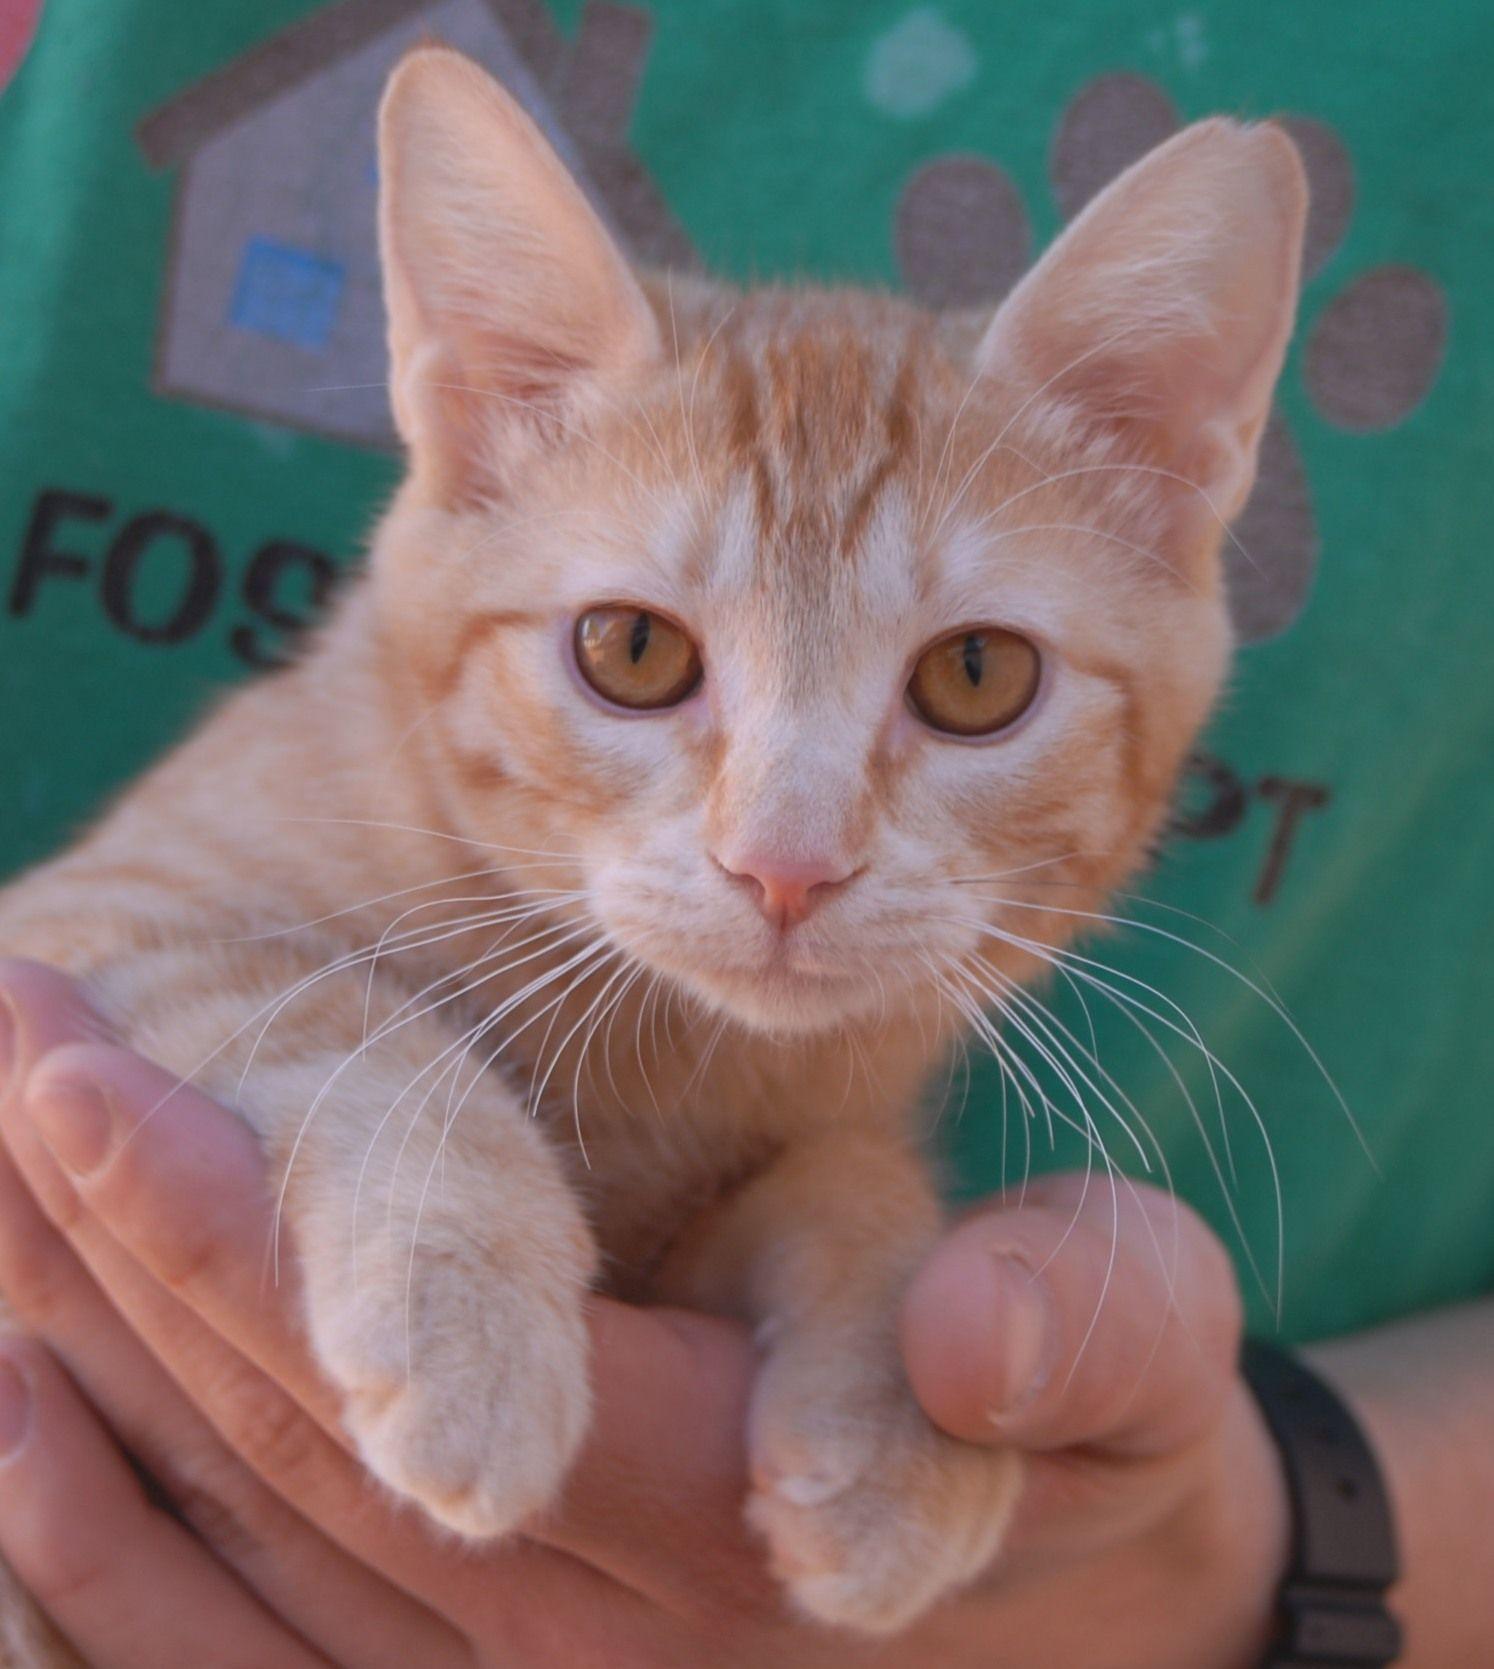 Spca Kittens Buffalo Ny - Best Cat And Kitten Image And